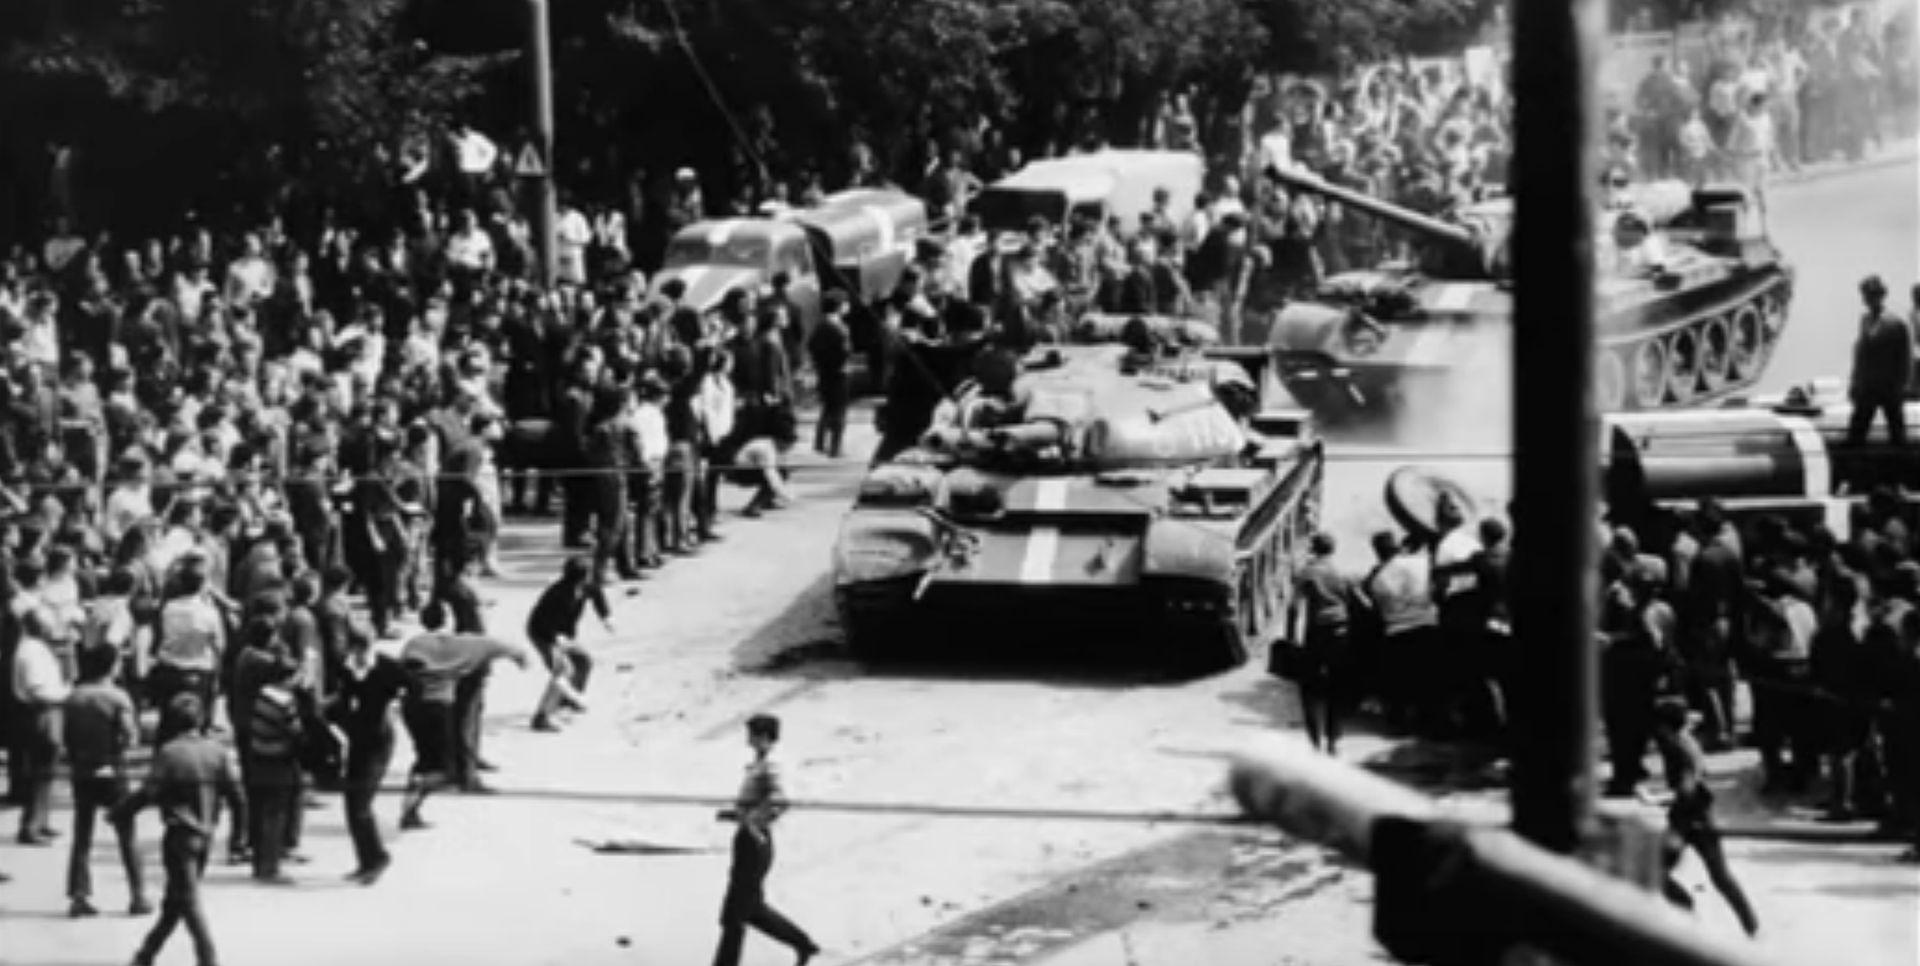 Pedeset godina od sovjetske invazije na Čehoslovačku